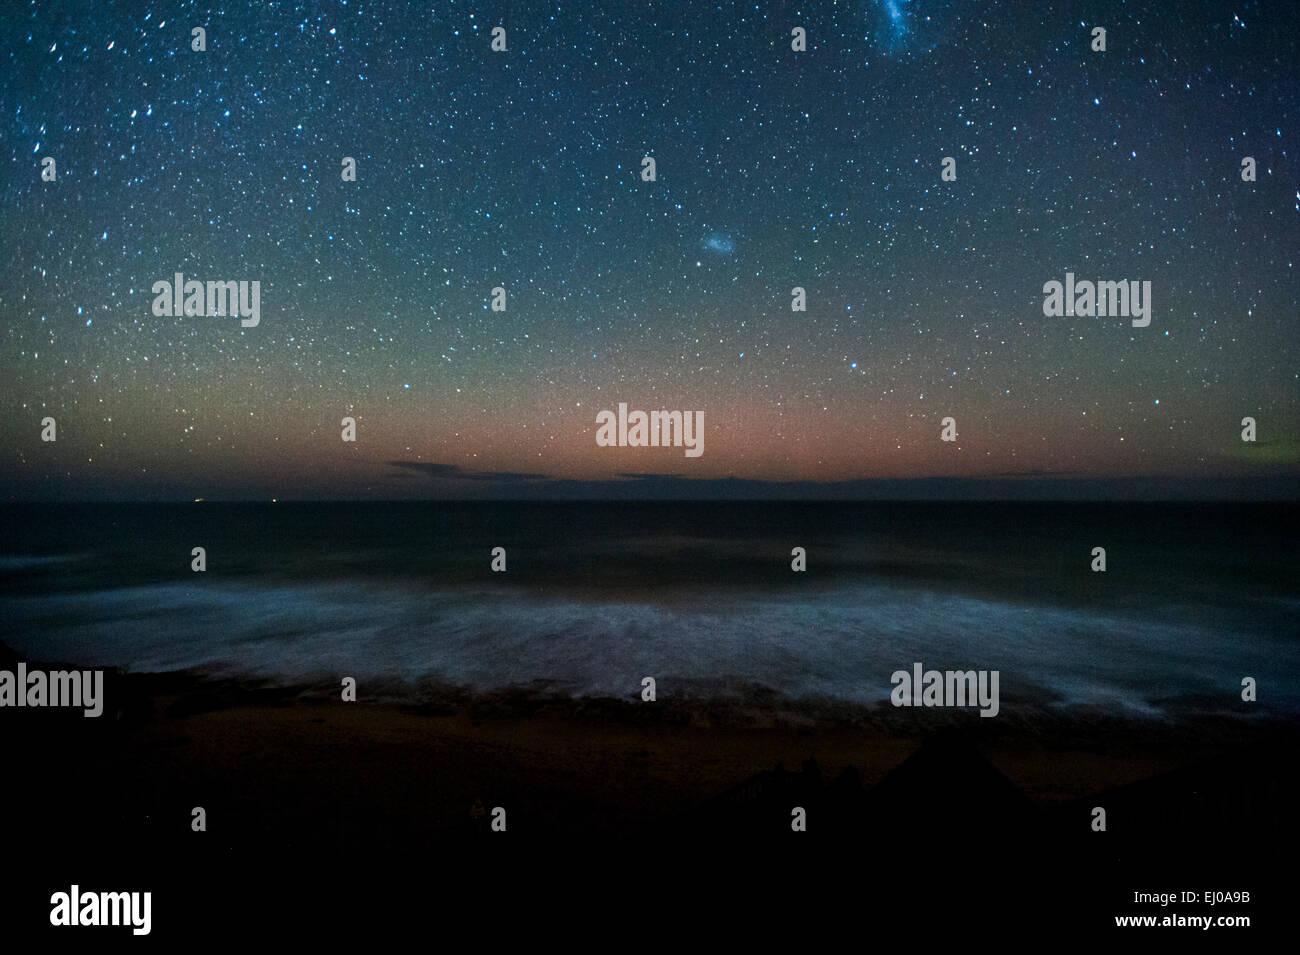 aurora australis (southern lights) and night sky from 13th beach. barwon heads. Victoria. Australia. 10pm 18mar2015. - Stock Image